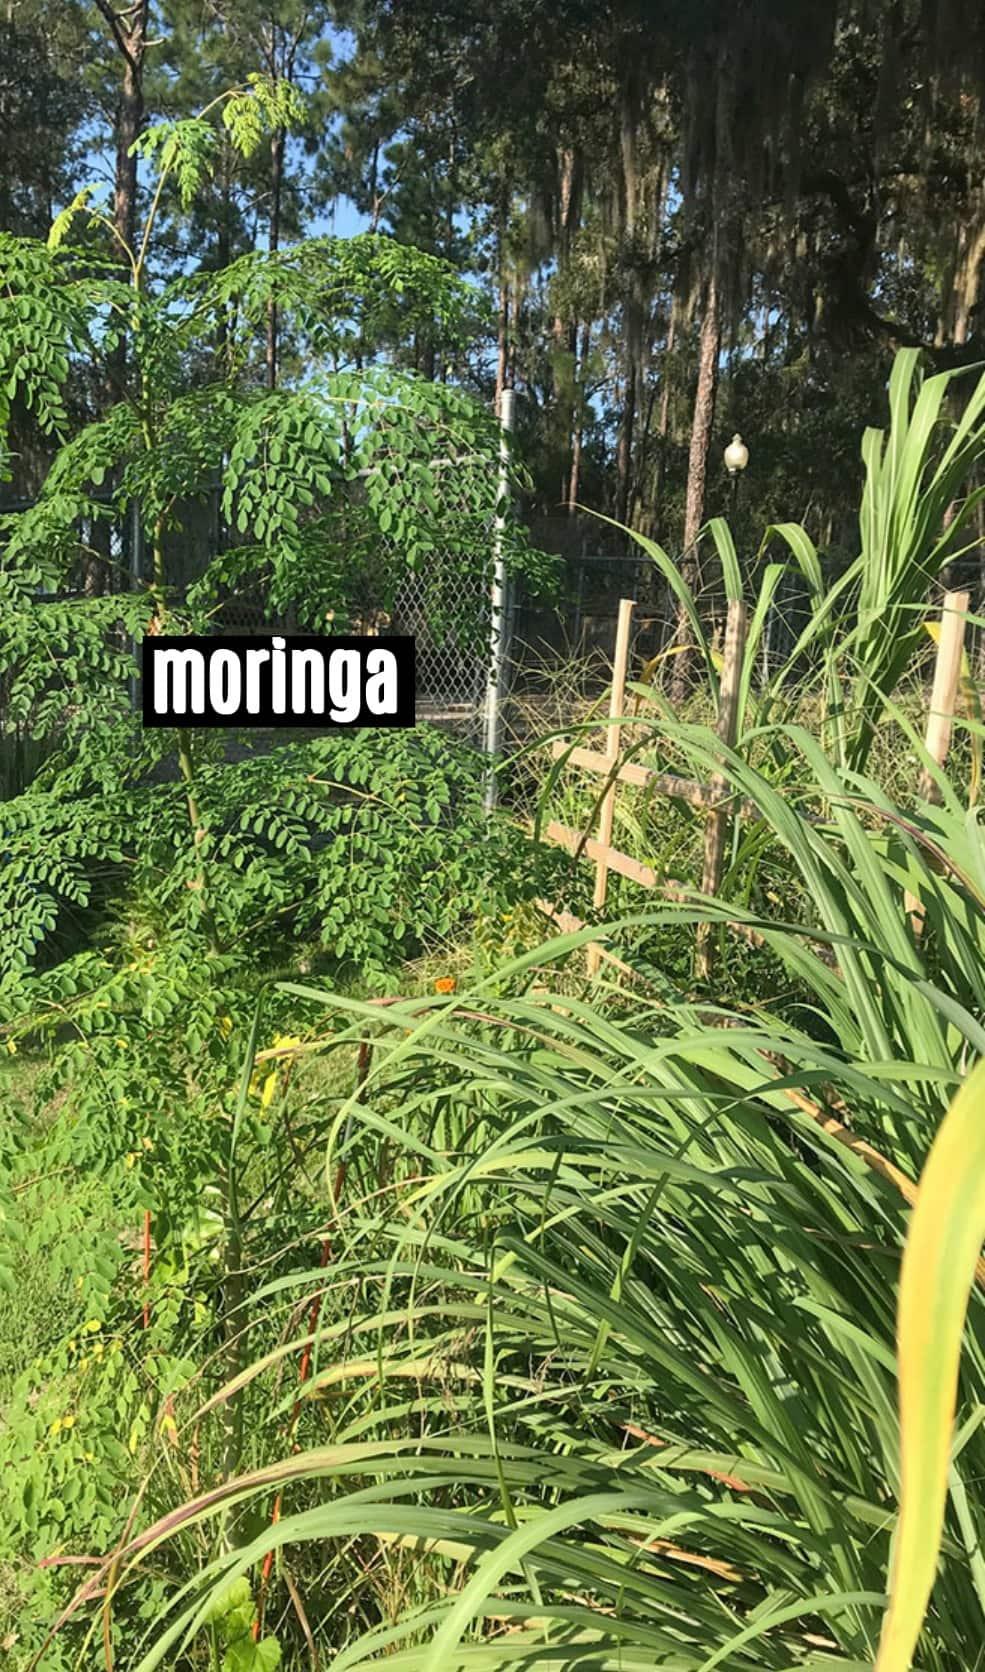 A tall moringa tree in my garden